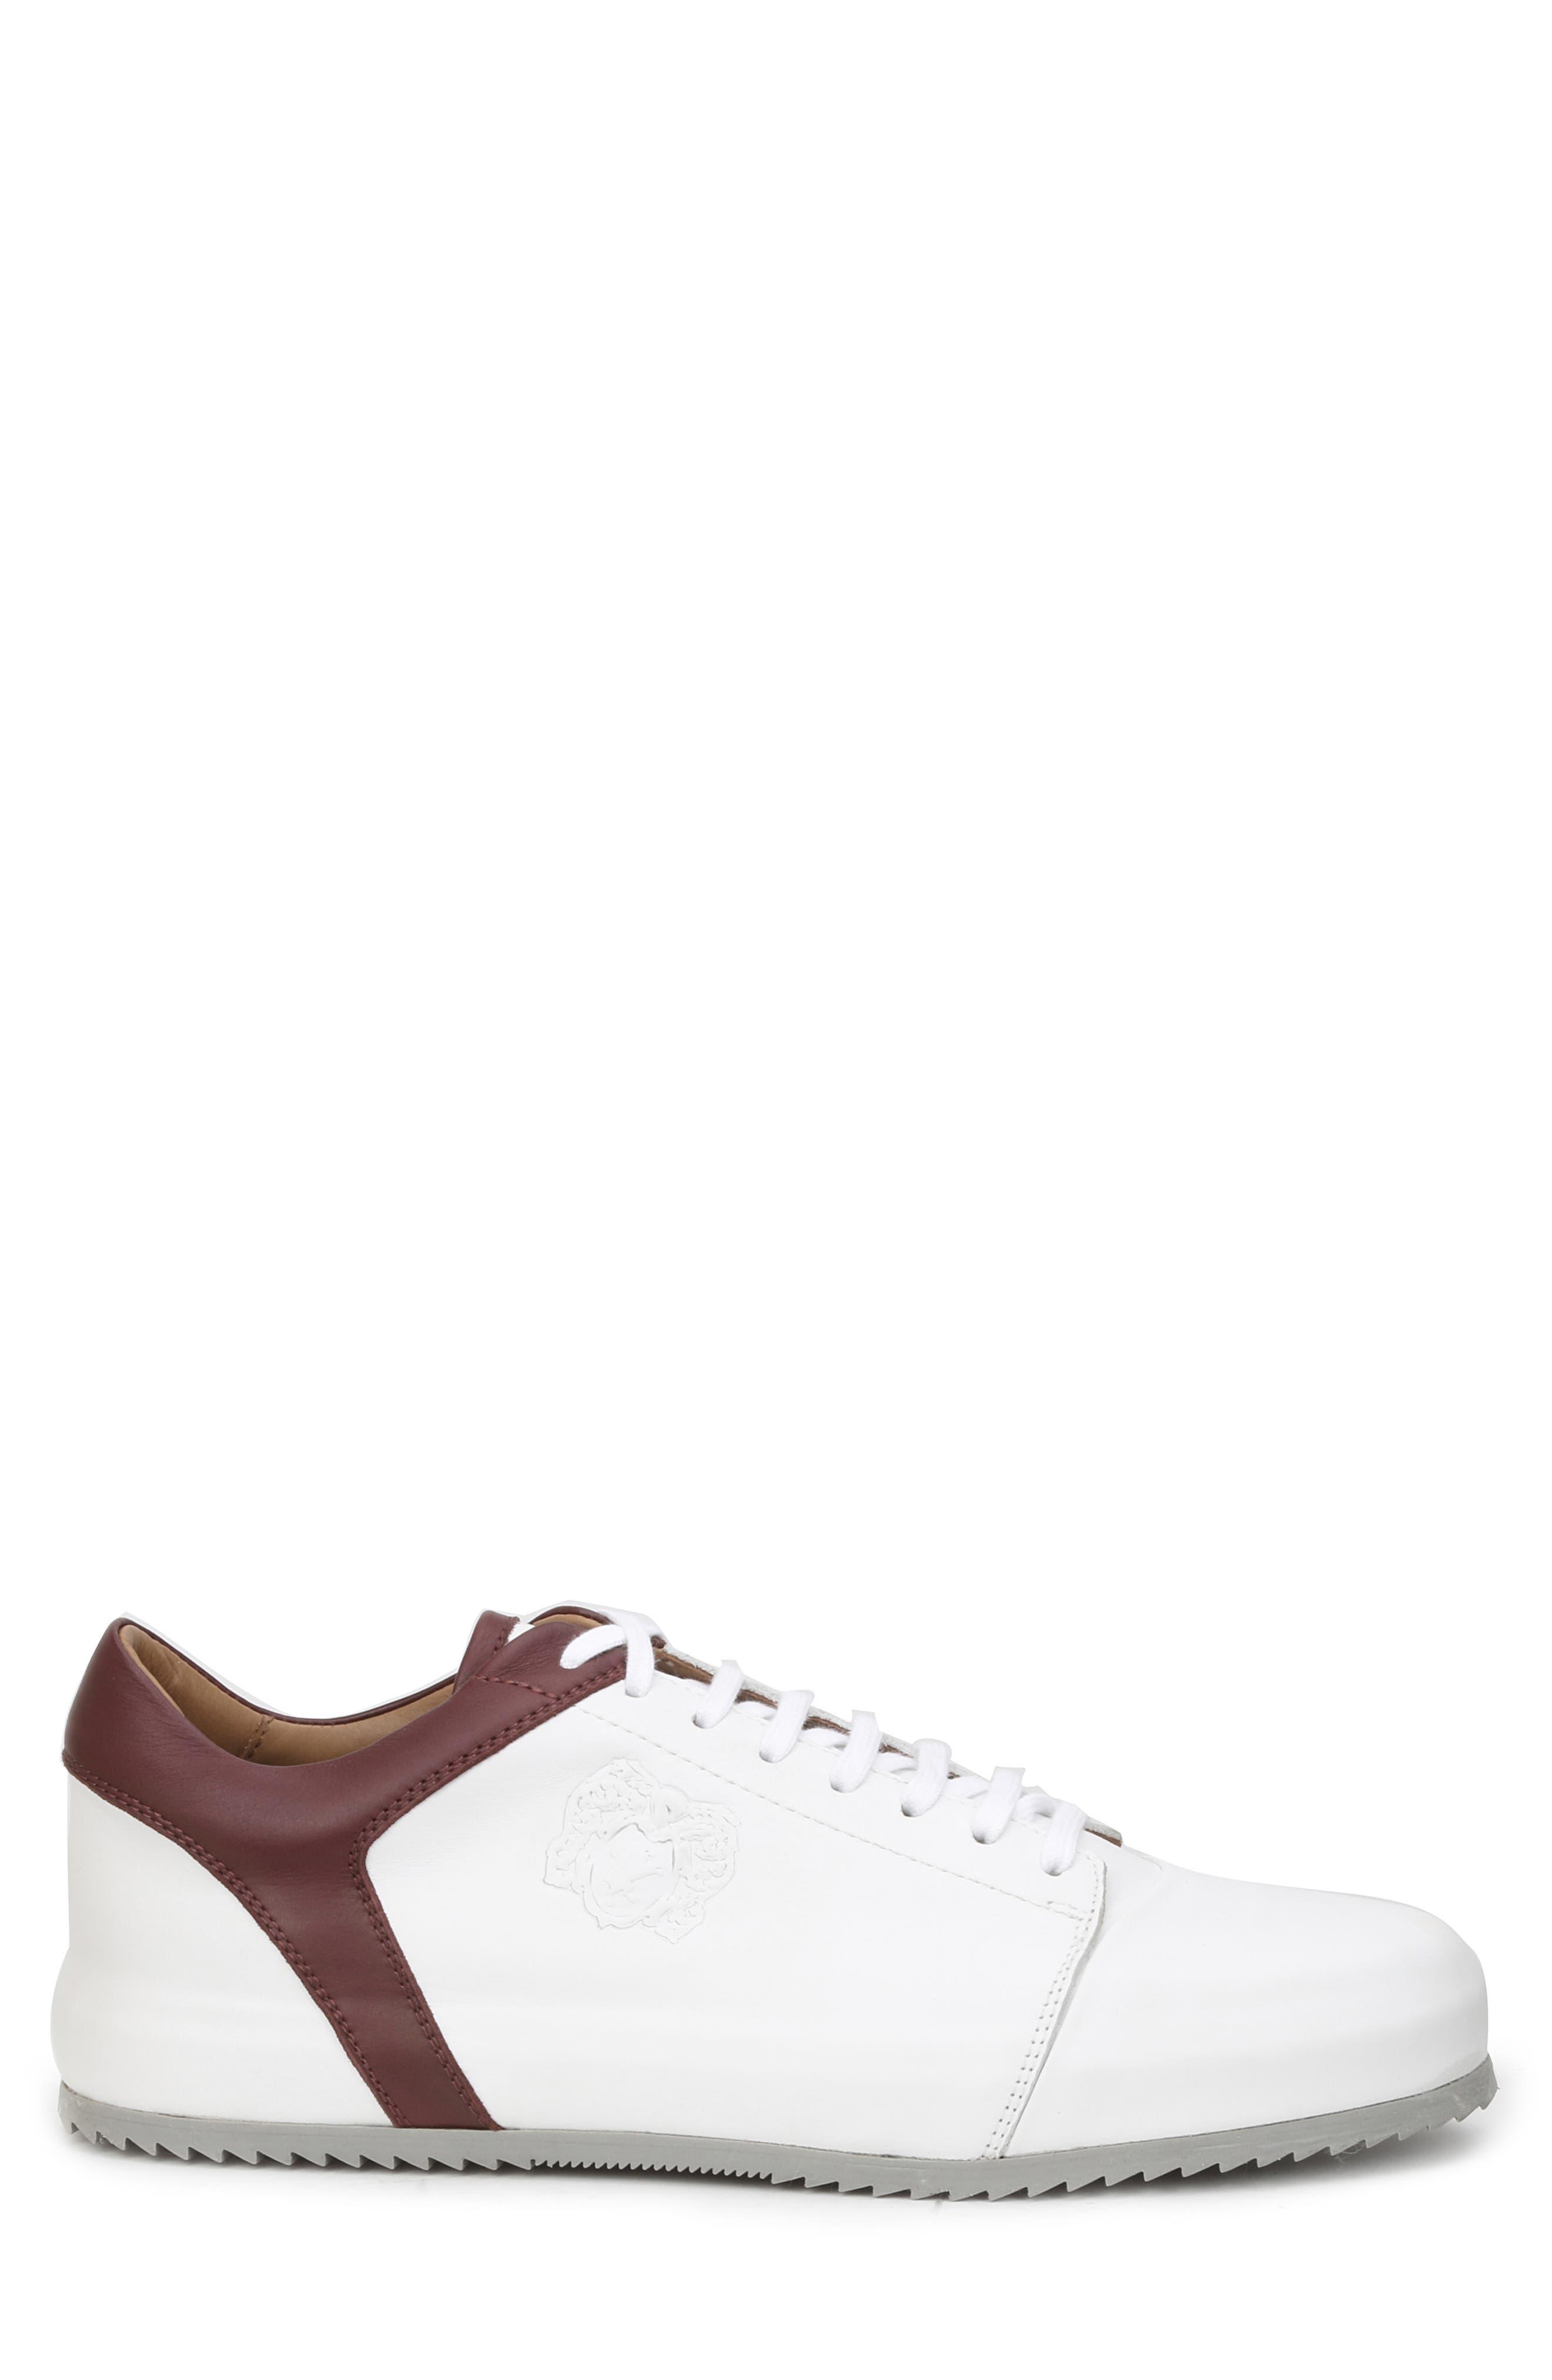 Santana Sneaker,                             Alternate thumbnail 3, color,                             WHITE/ BORDEAUX